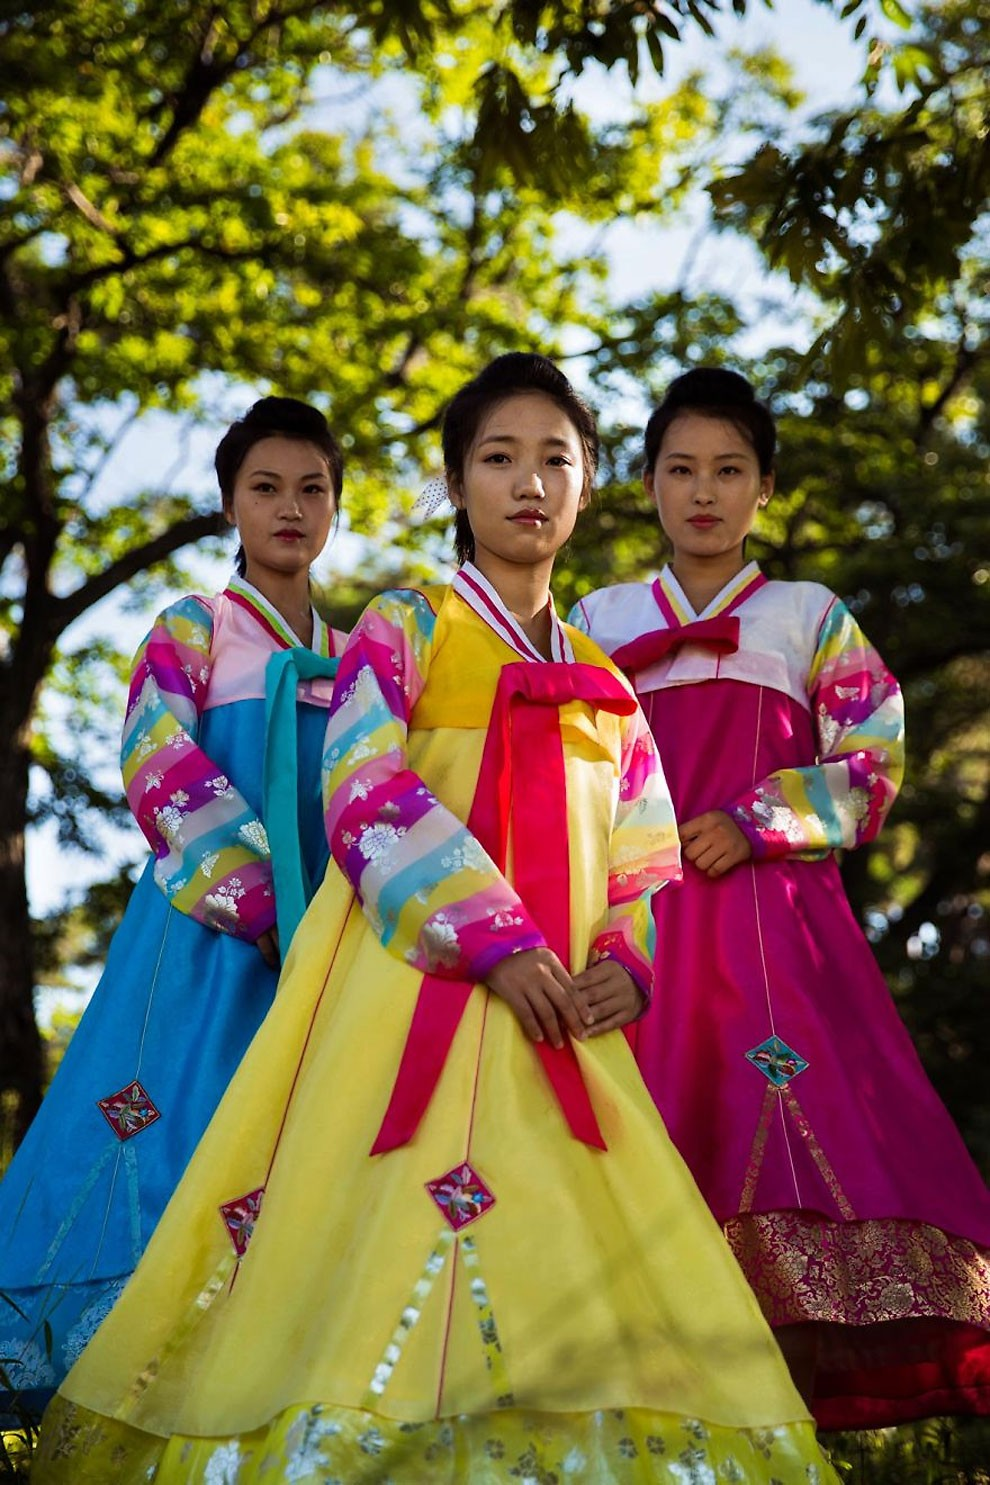 foto-donne-corea-atlas-of-beauty-mihaela-noroc-09